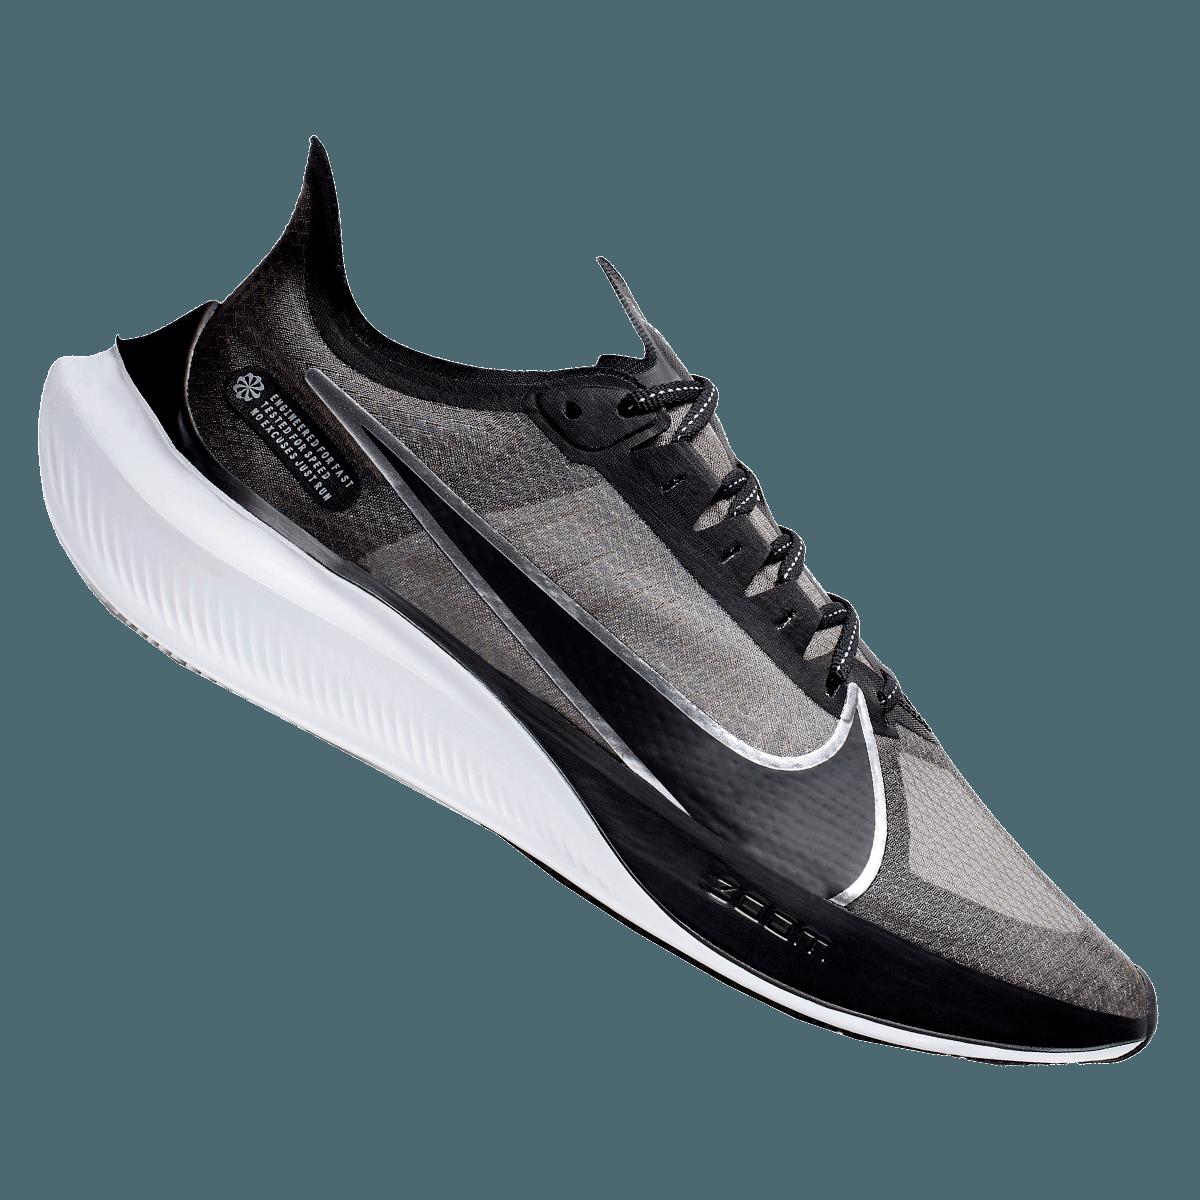 Nike Laufschuh Zoom Gravity schwarzsilber